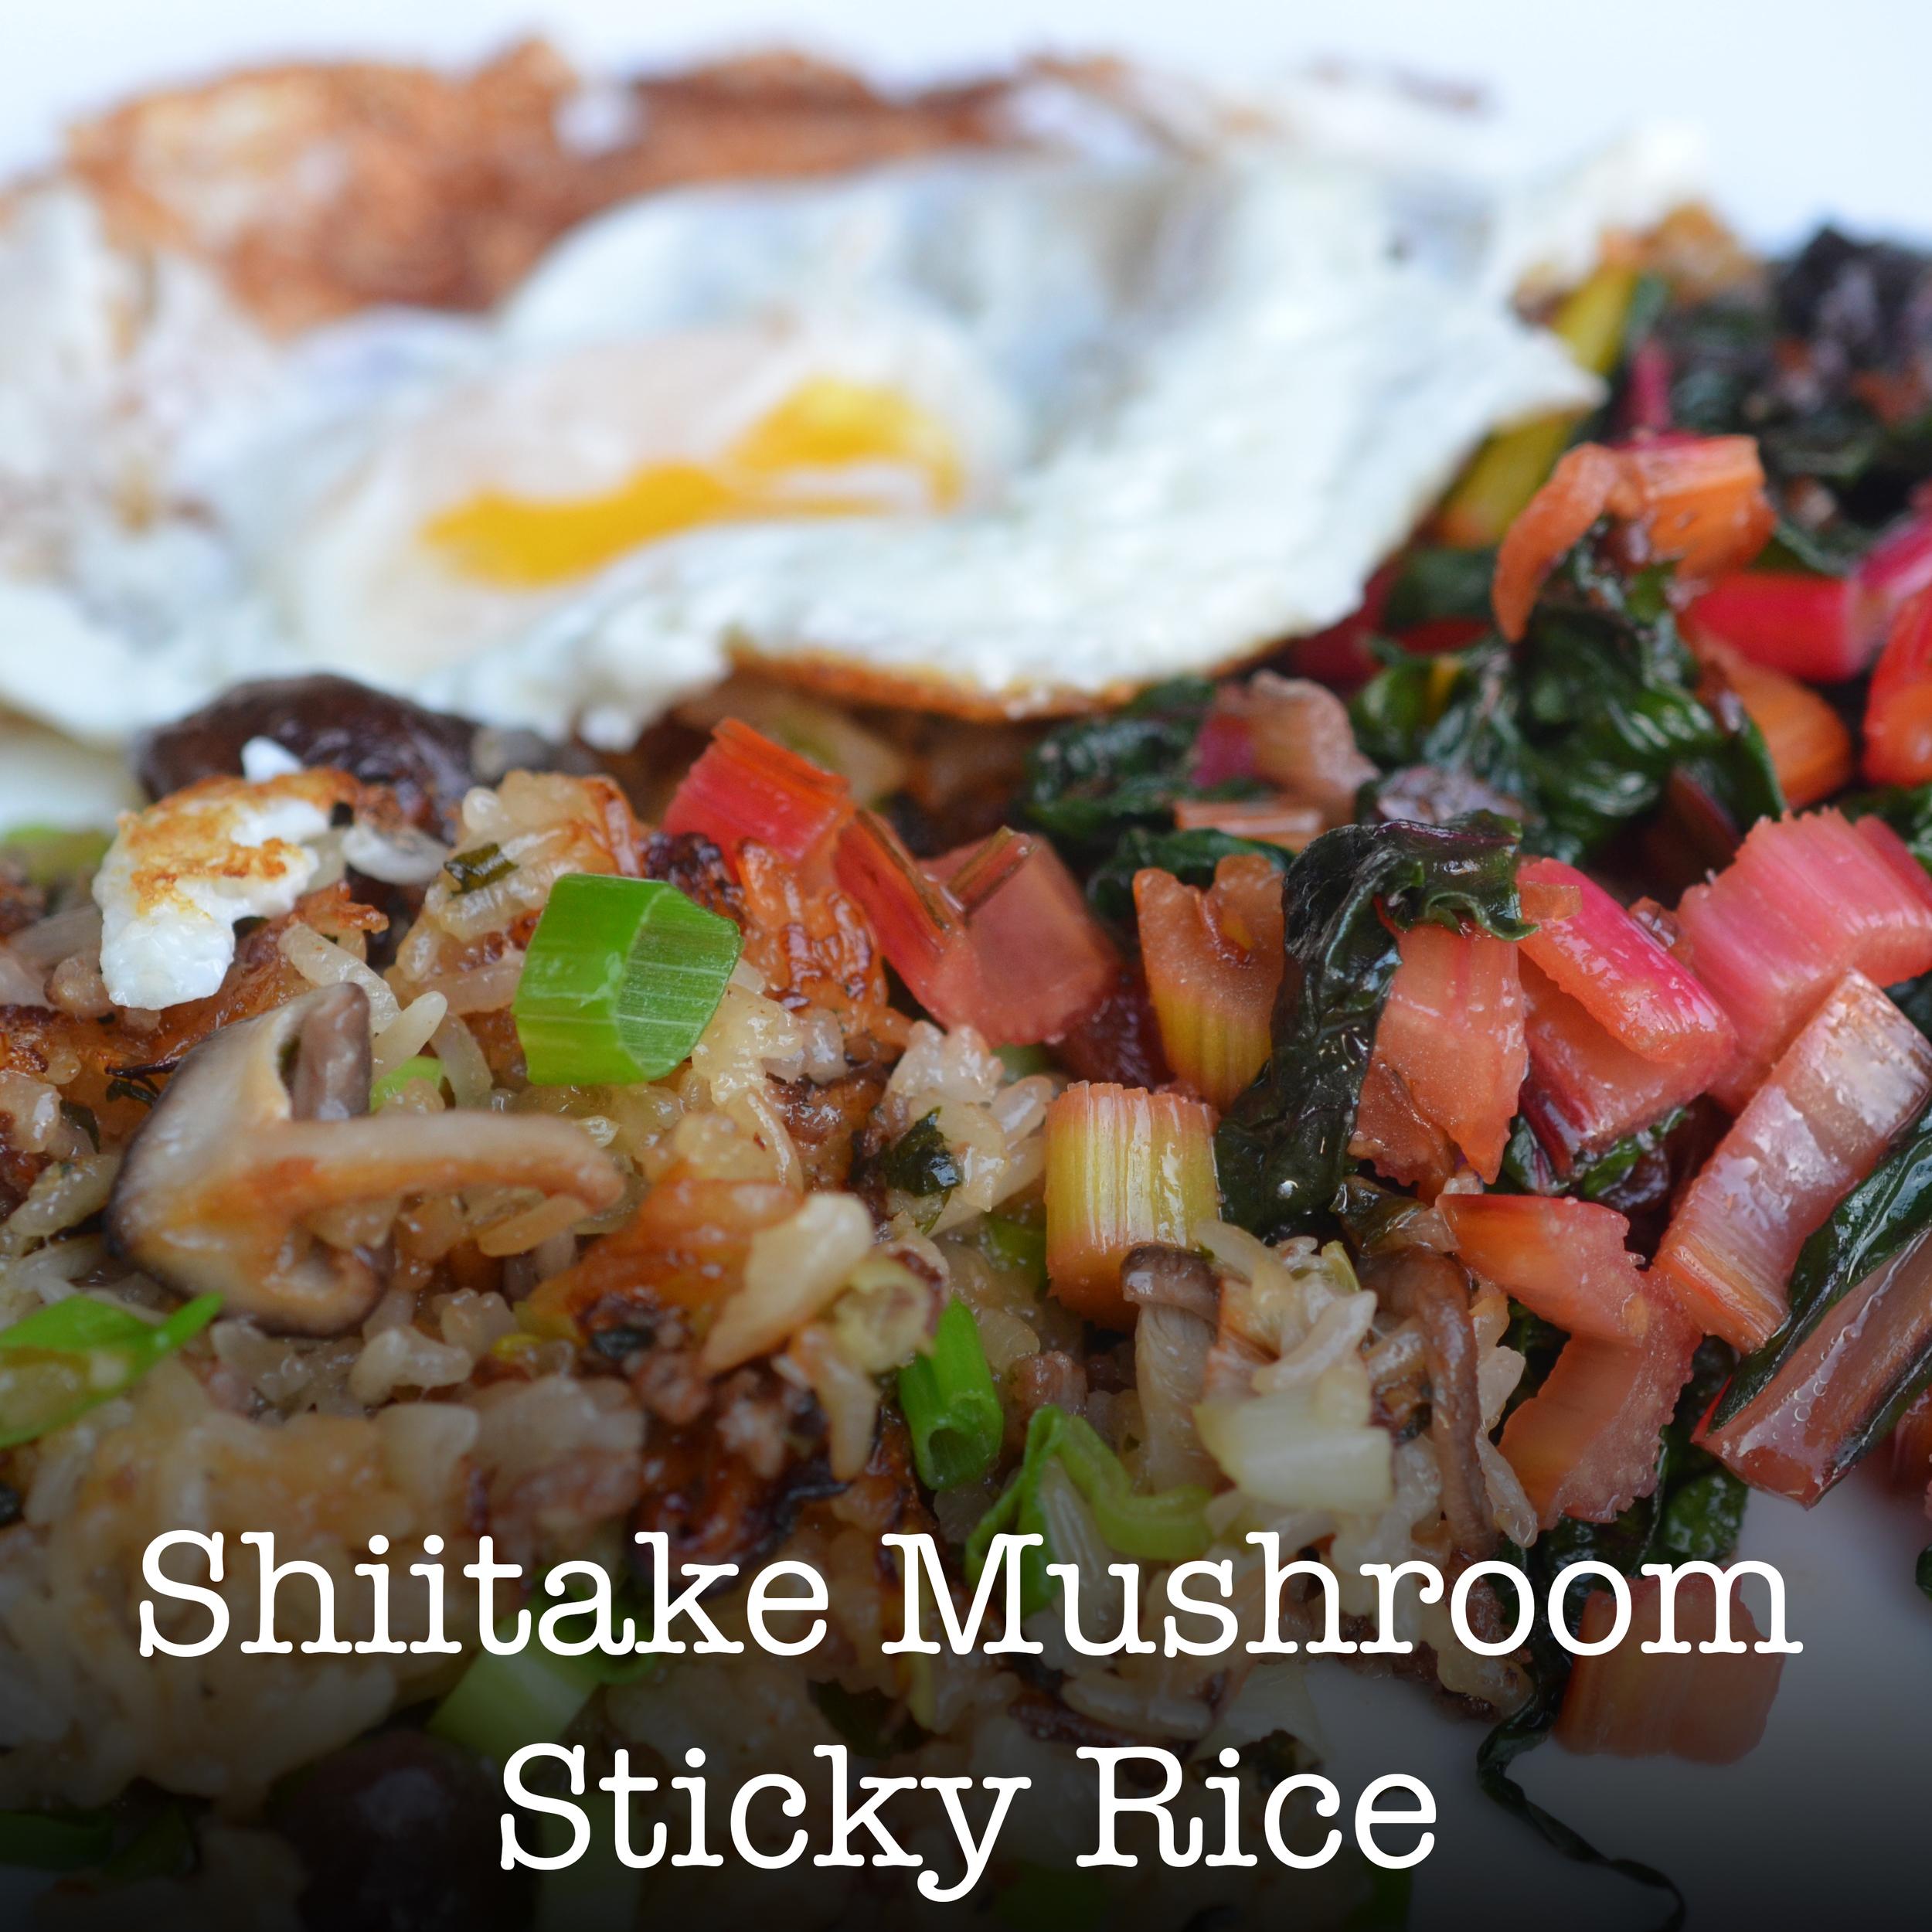 Shiitake Mushroom Sticky Rice.jpg